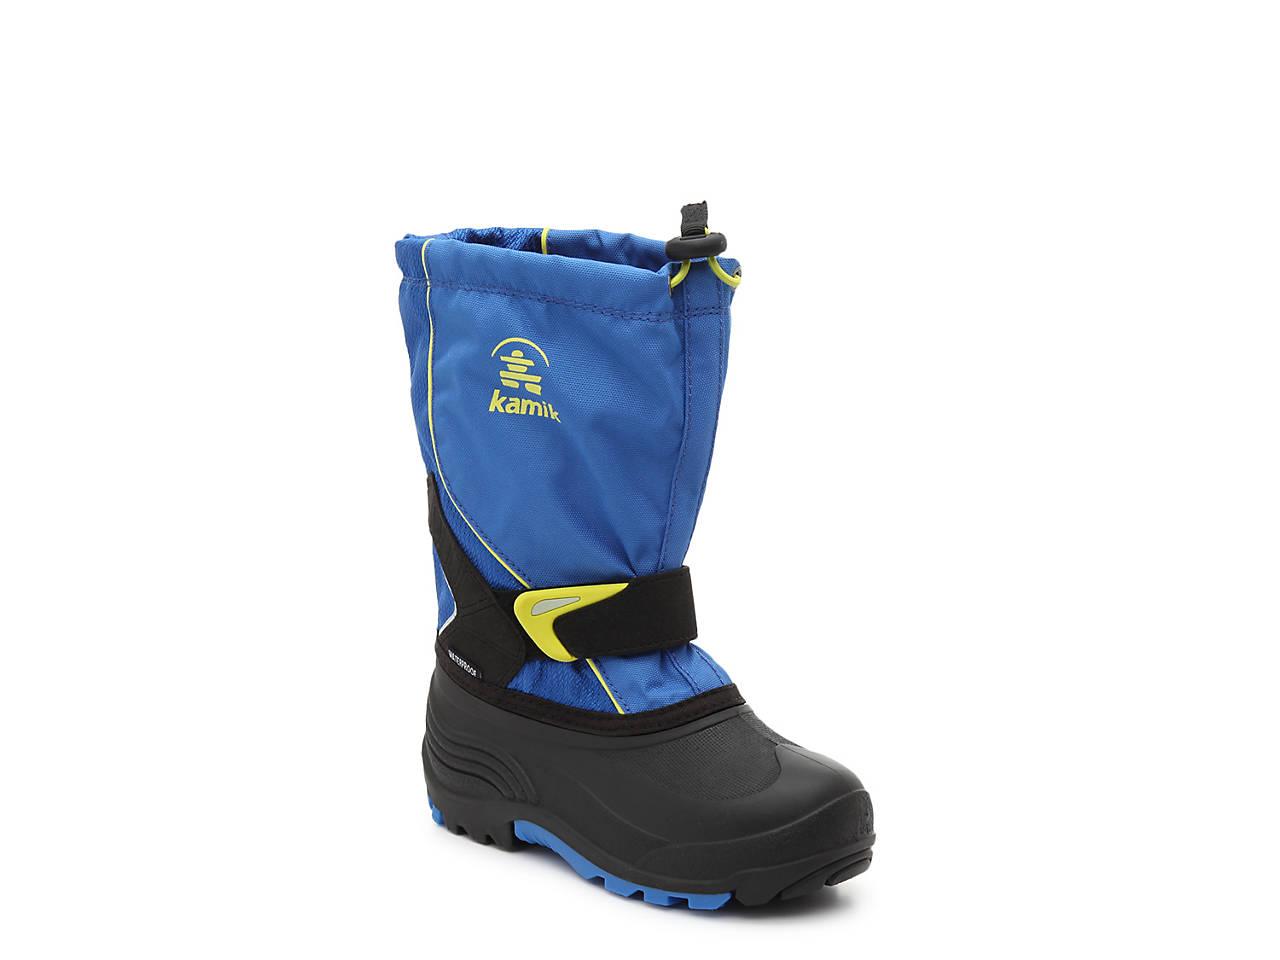 c957caeb7faf Kamik Sleet Youth Snow Boot Kids Shoes